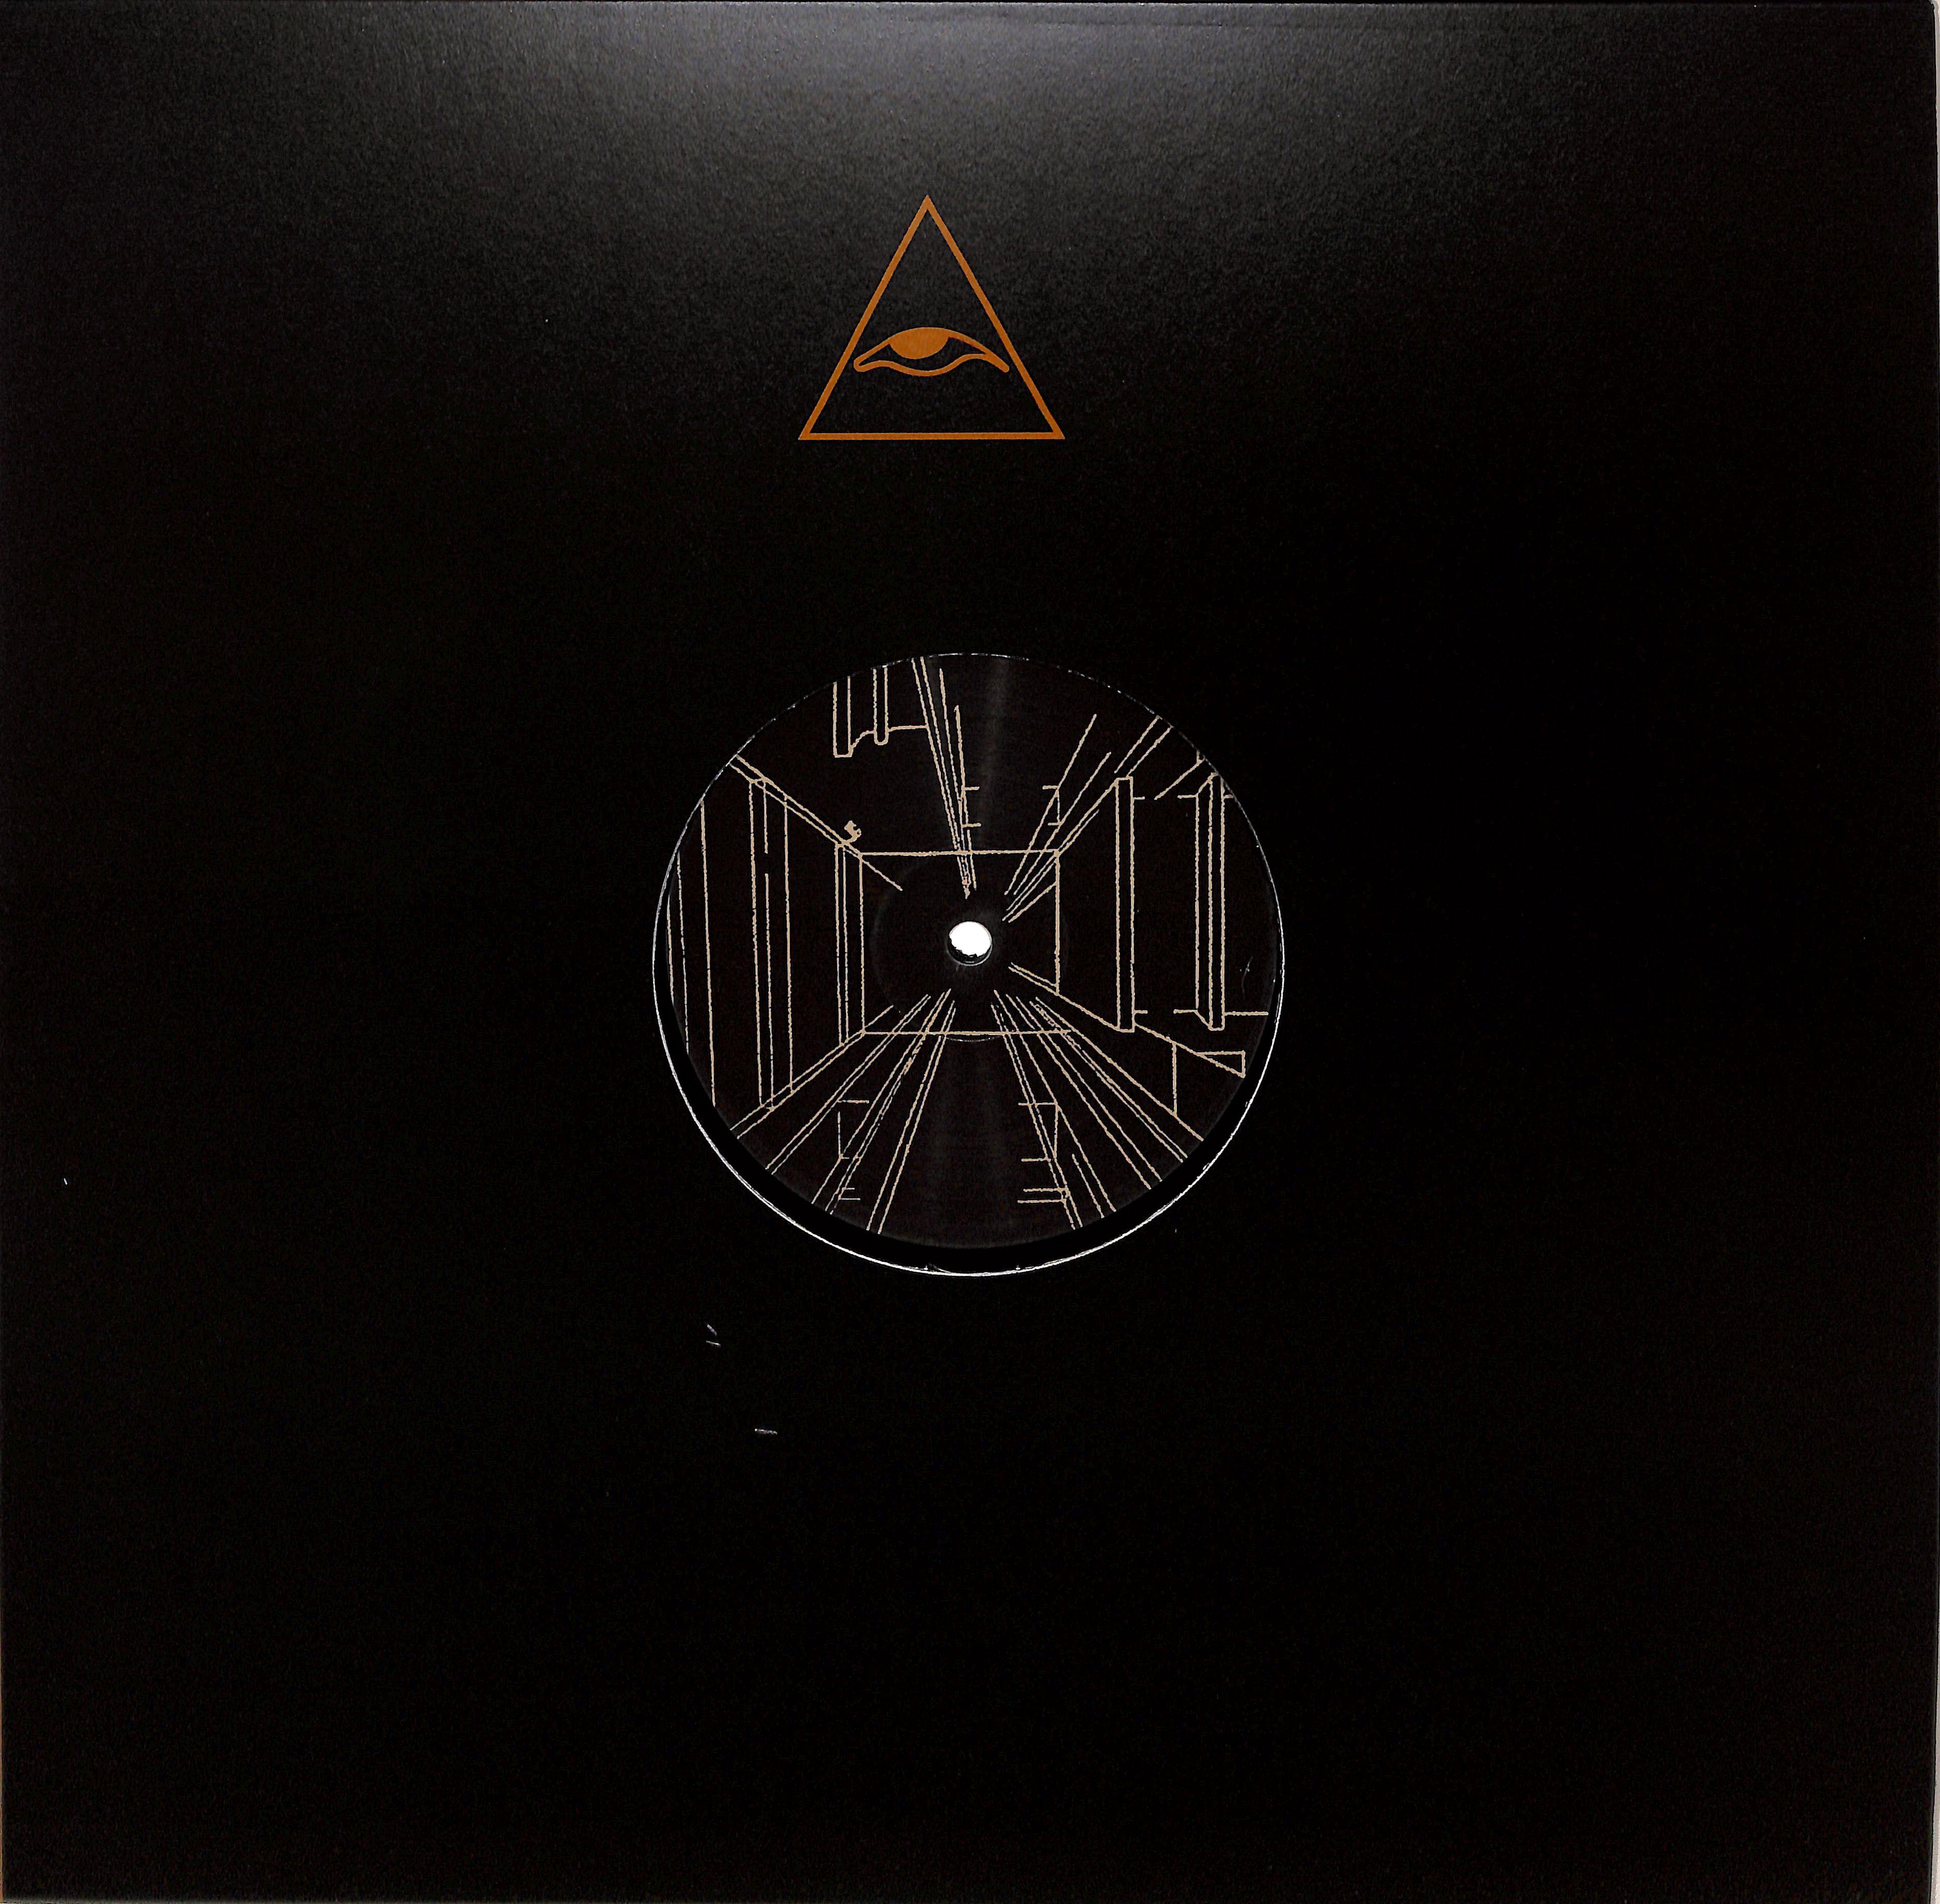 Gianluca Pegoiani - THE FIFTH ROOM EP